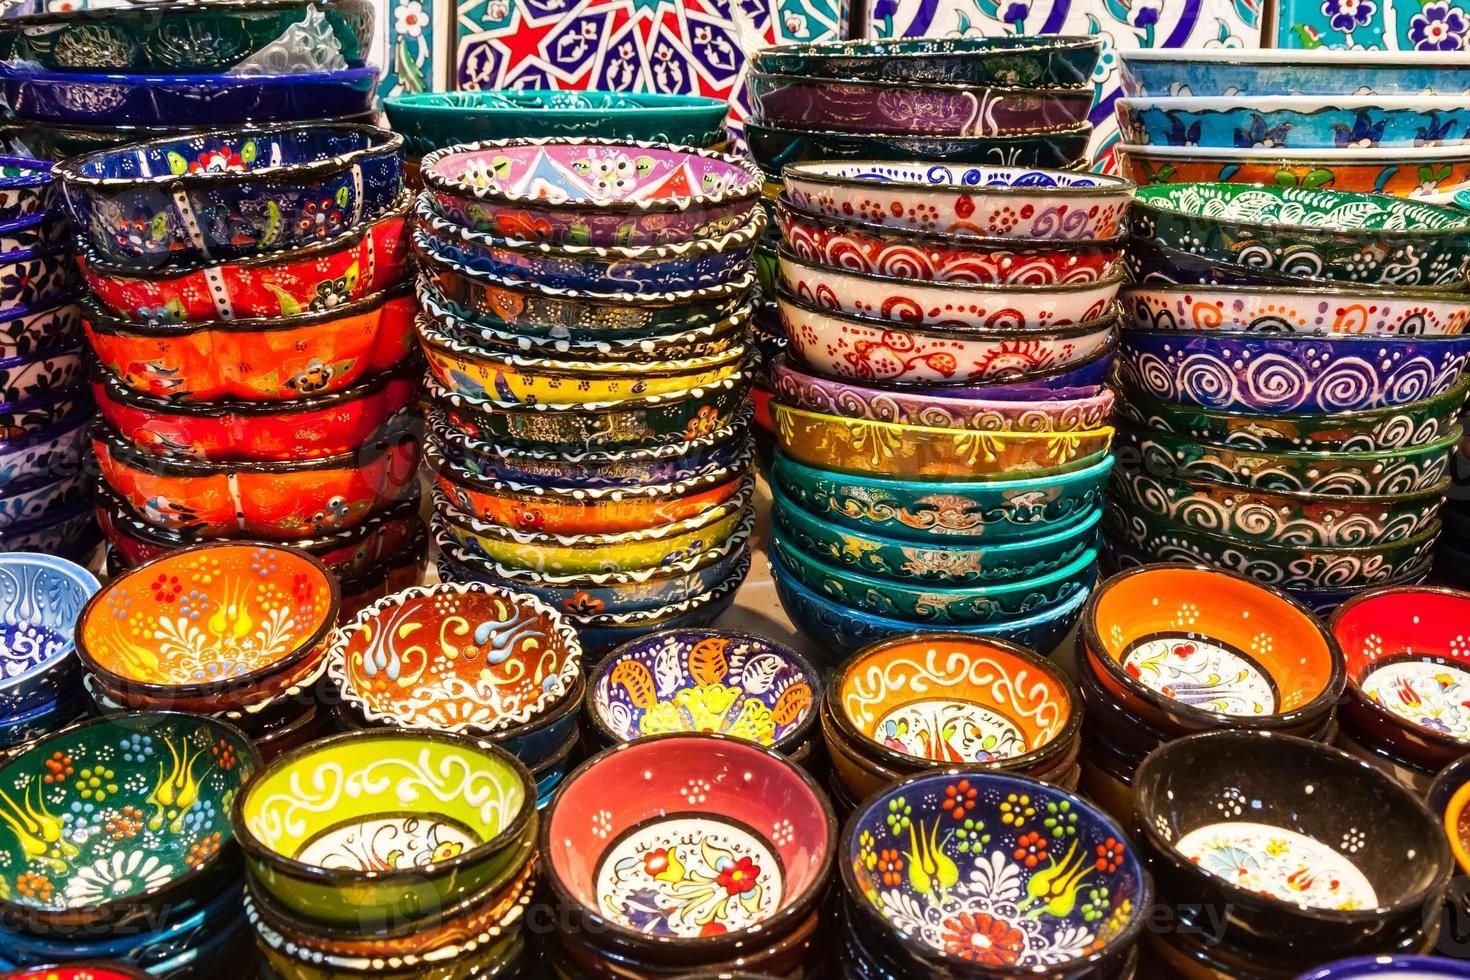 Classical Turkish ceramics on the market photo